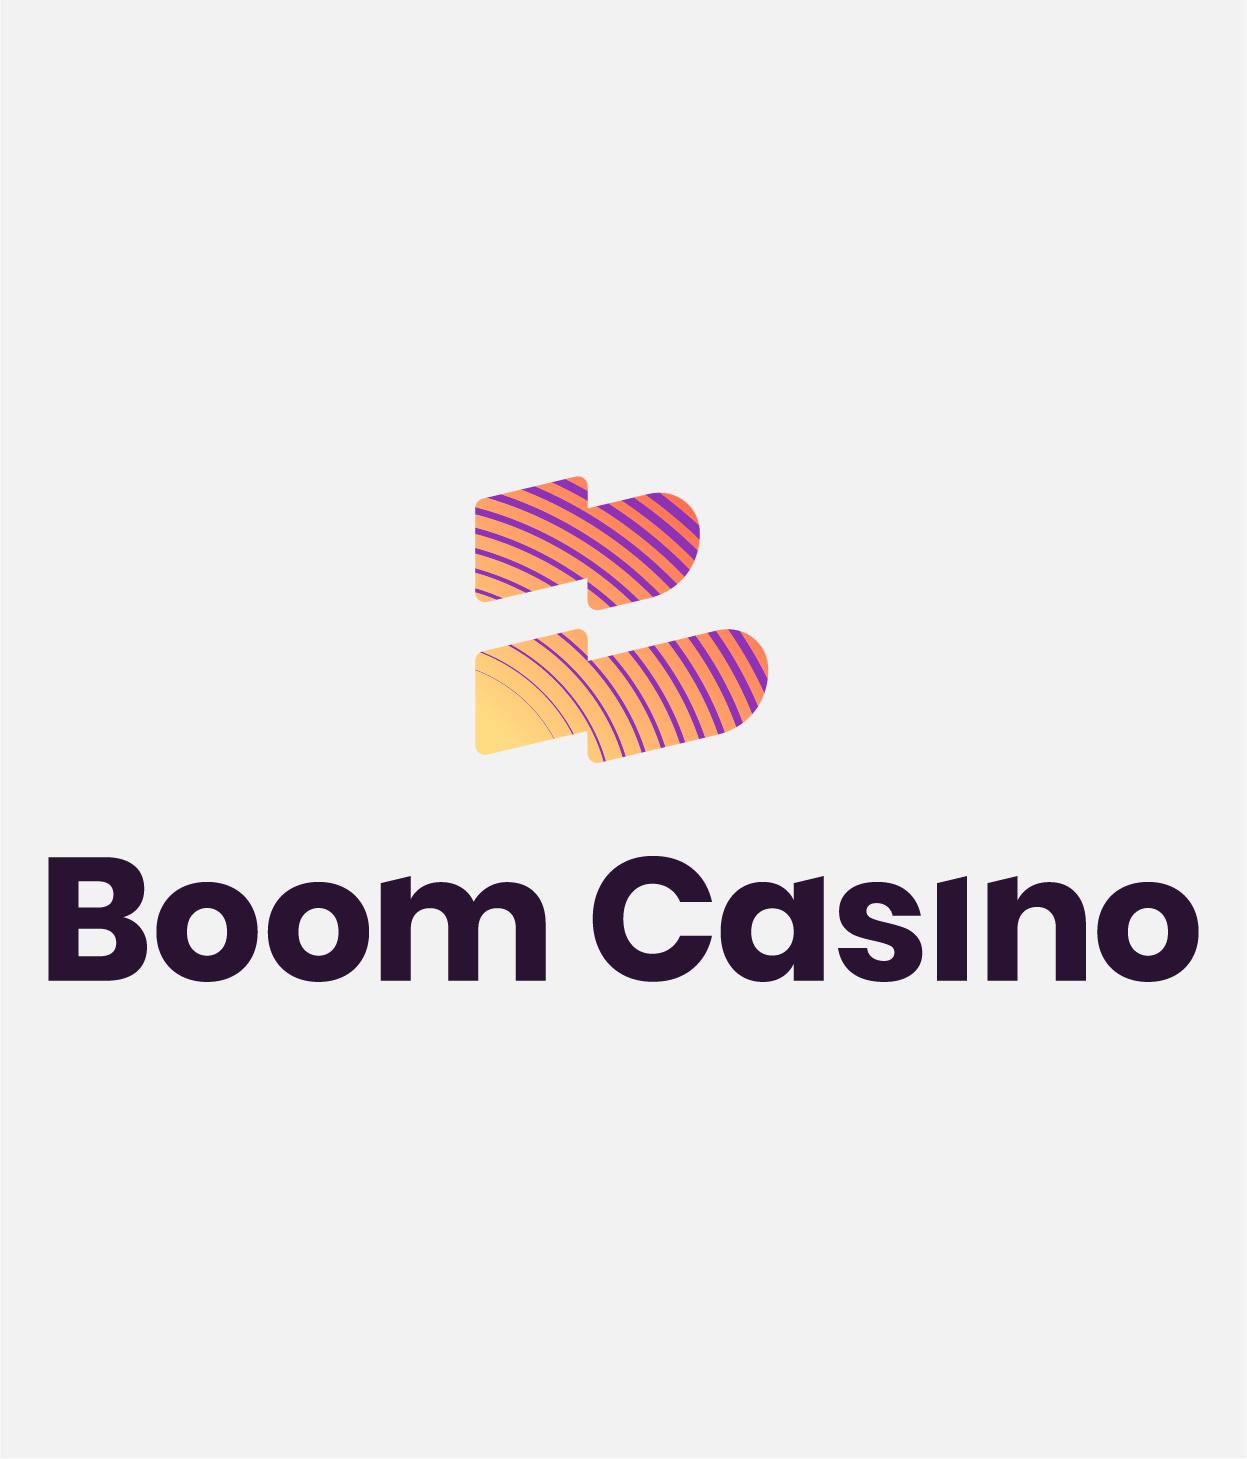 Boom Casino image